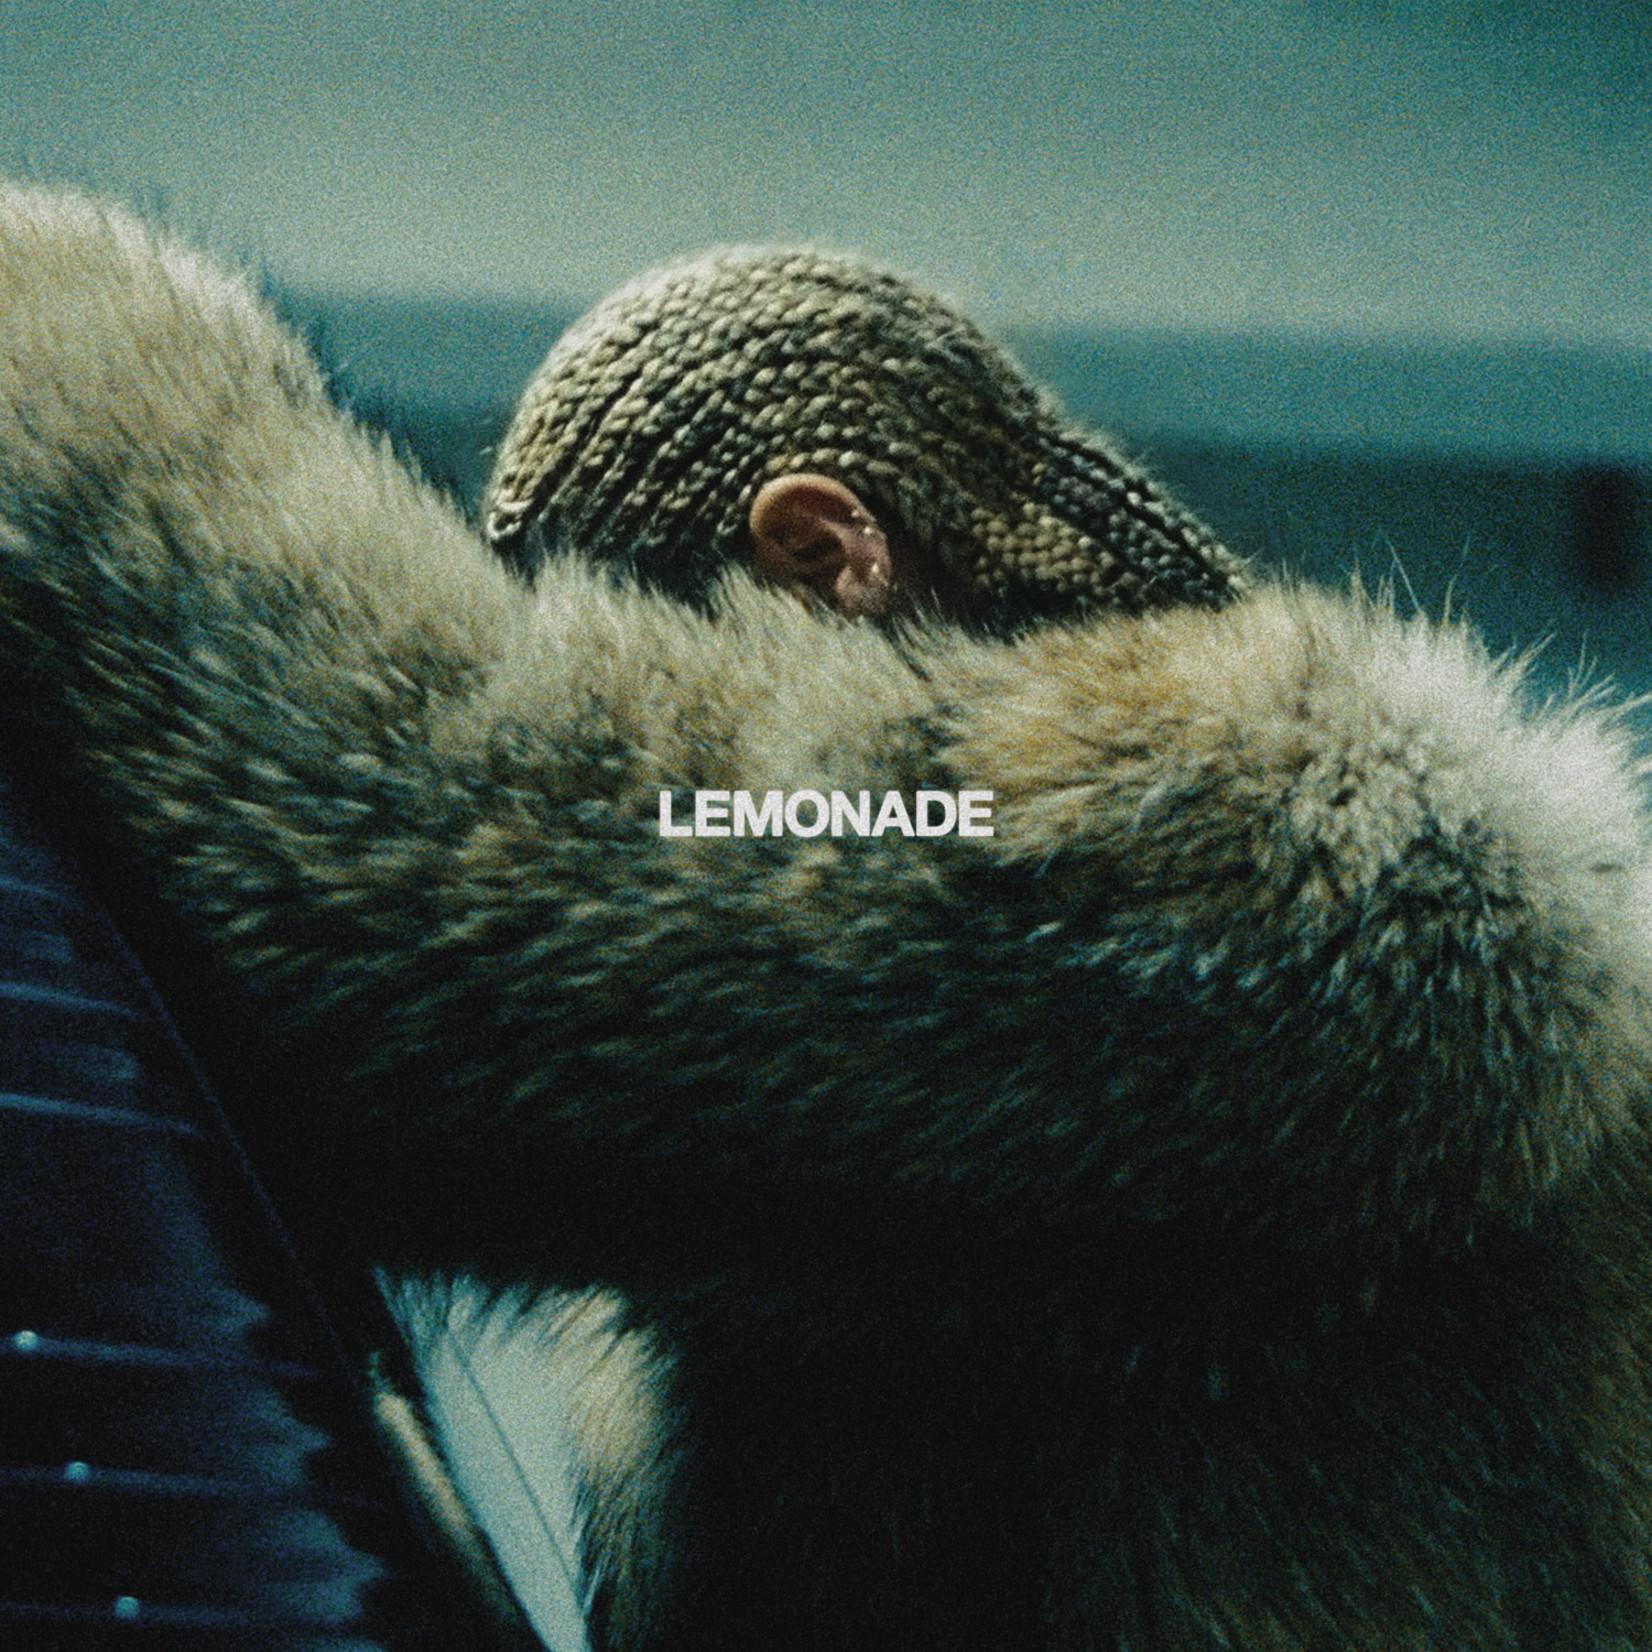 [New] Beyonce: Lemonade (2LP, yellow vinyl)